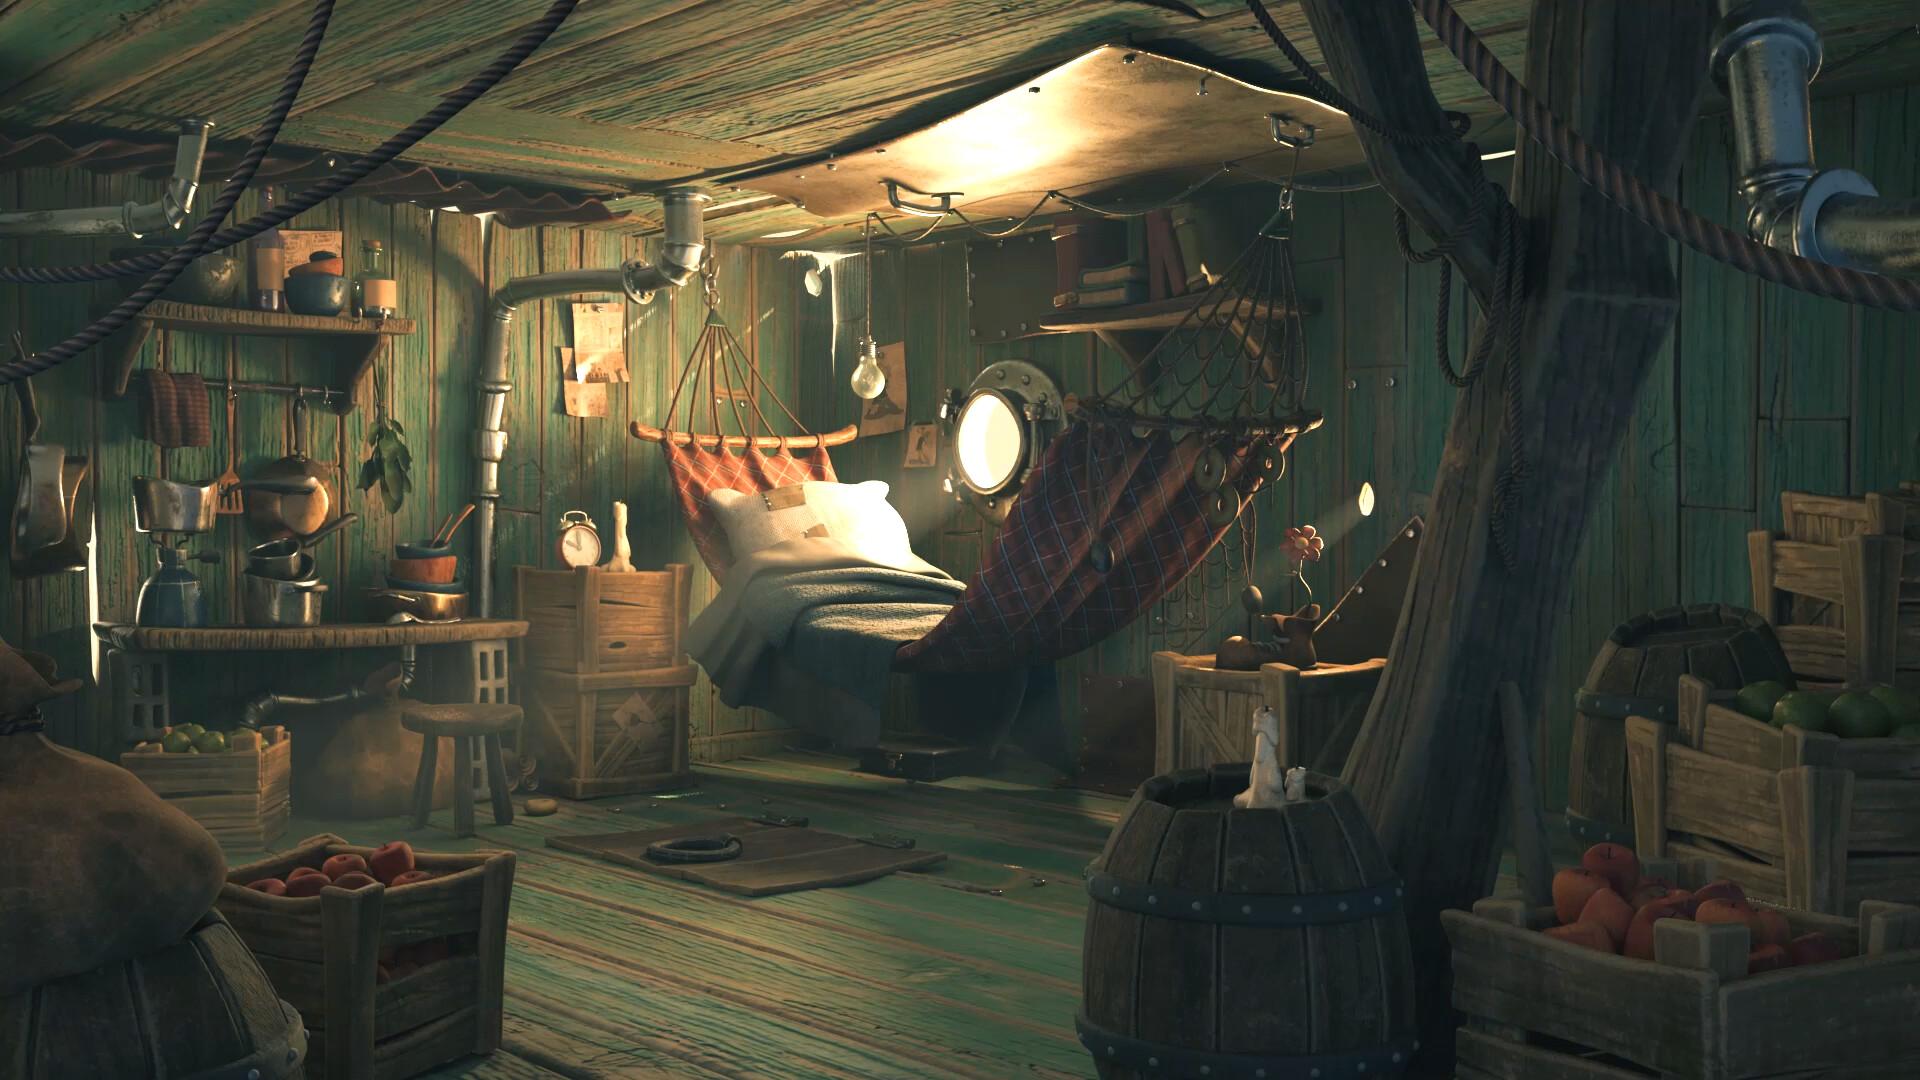 Popeye's Cabin